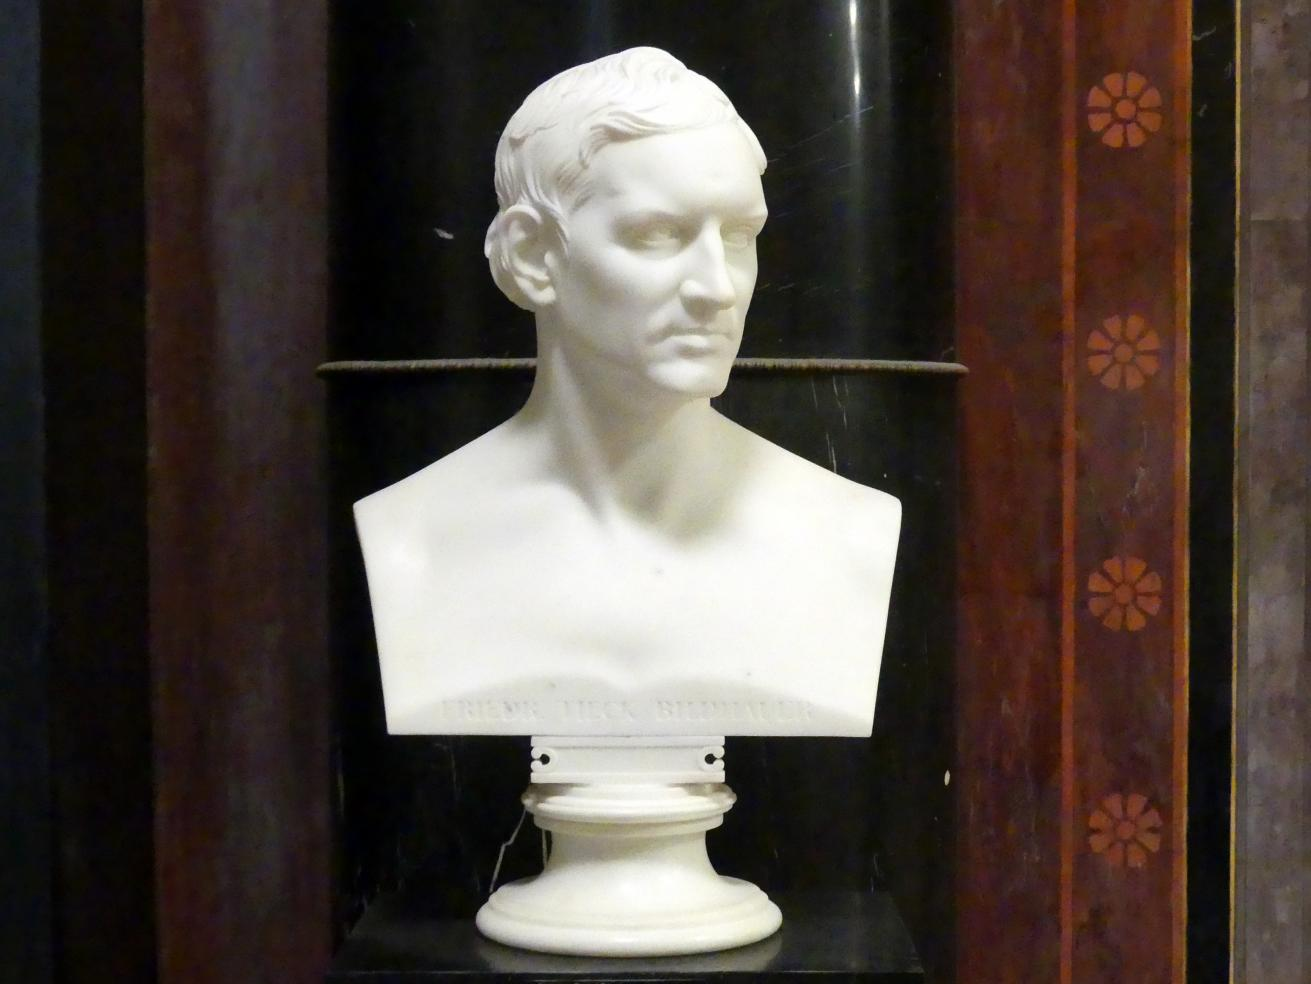 Christian Daniel Rauch: Christian Friedrich Tieck, 1825 - 1839